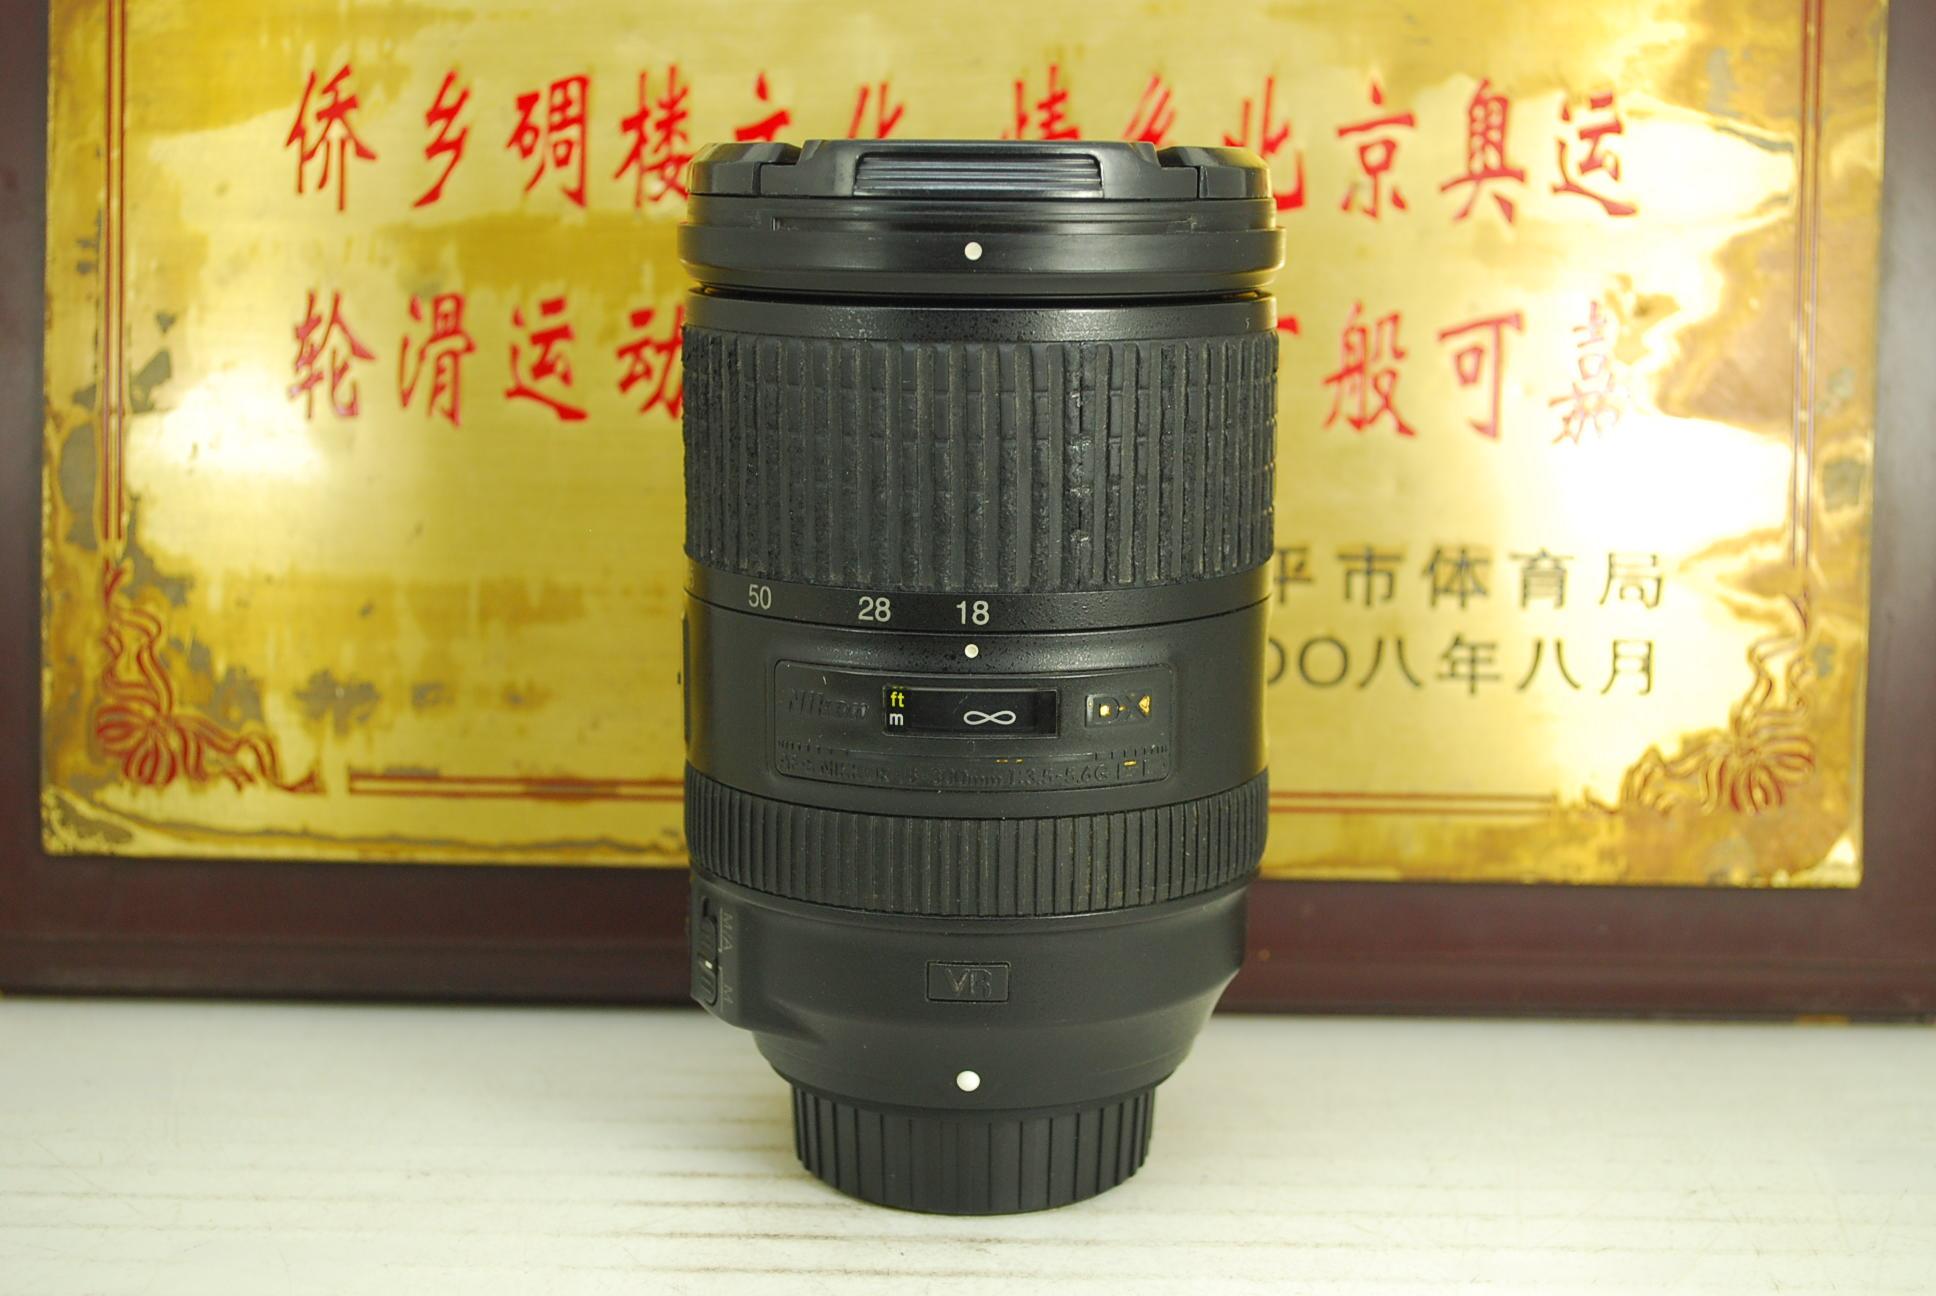 尼康 18-300 F3.5-5.6G VR 一代 77mm 单反镜头 防抖 一镜走天下